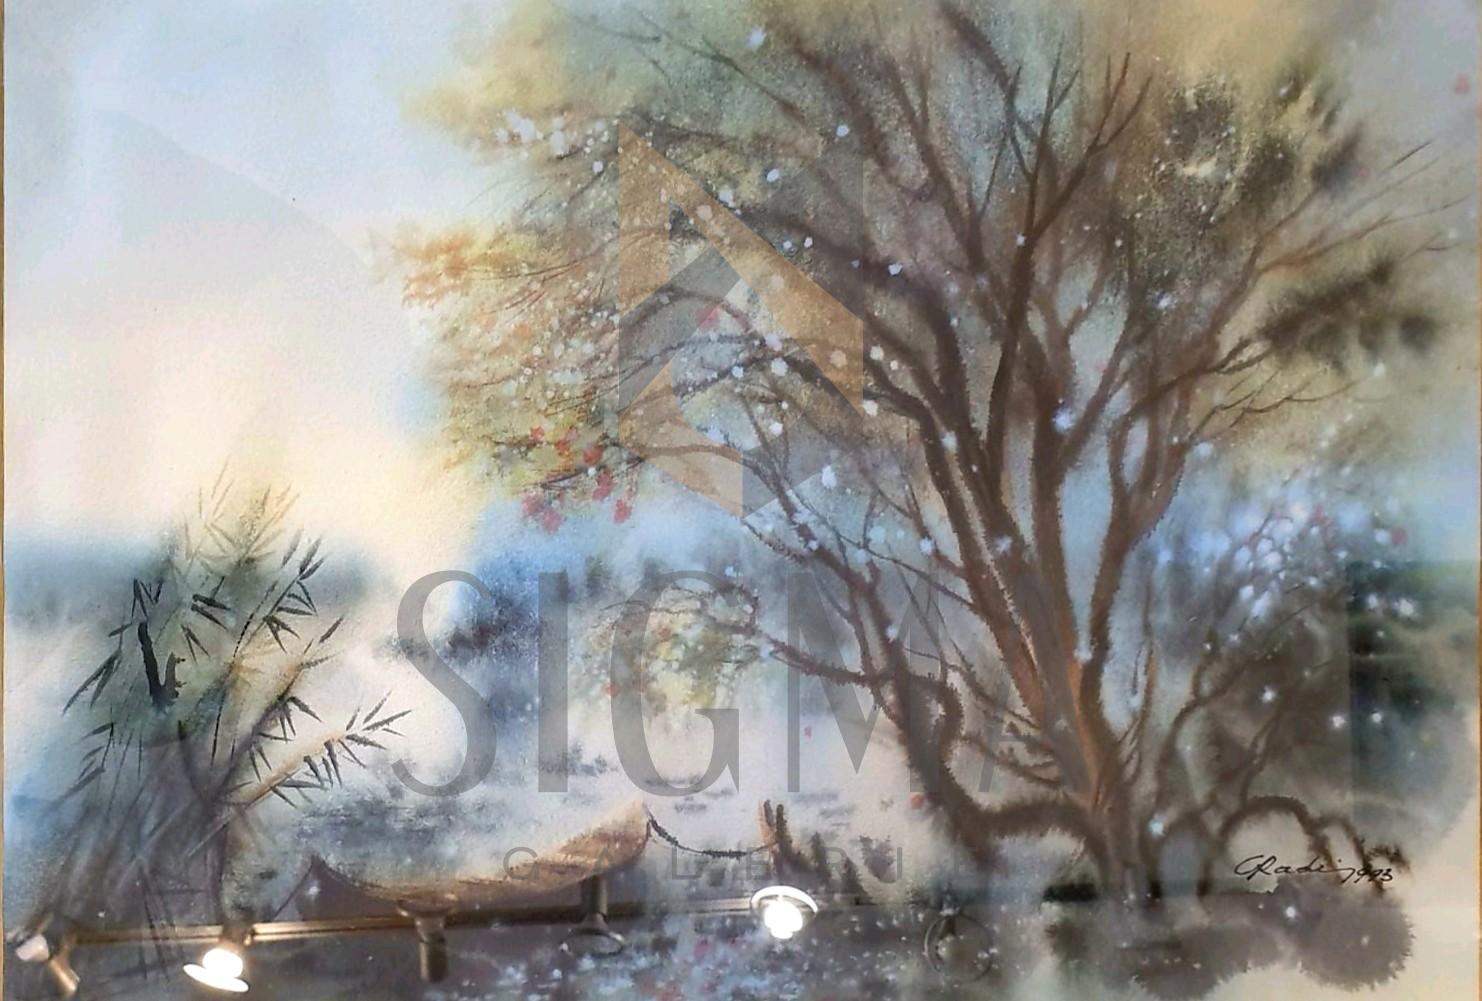 "Tablou, Lucian Cristian Radi (N. 1954 Craiova), ""Peisaj din delta"", tehnica mixta, acuarela pe hartie, dim: 35x50 cm"